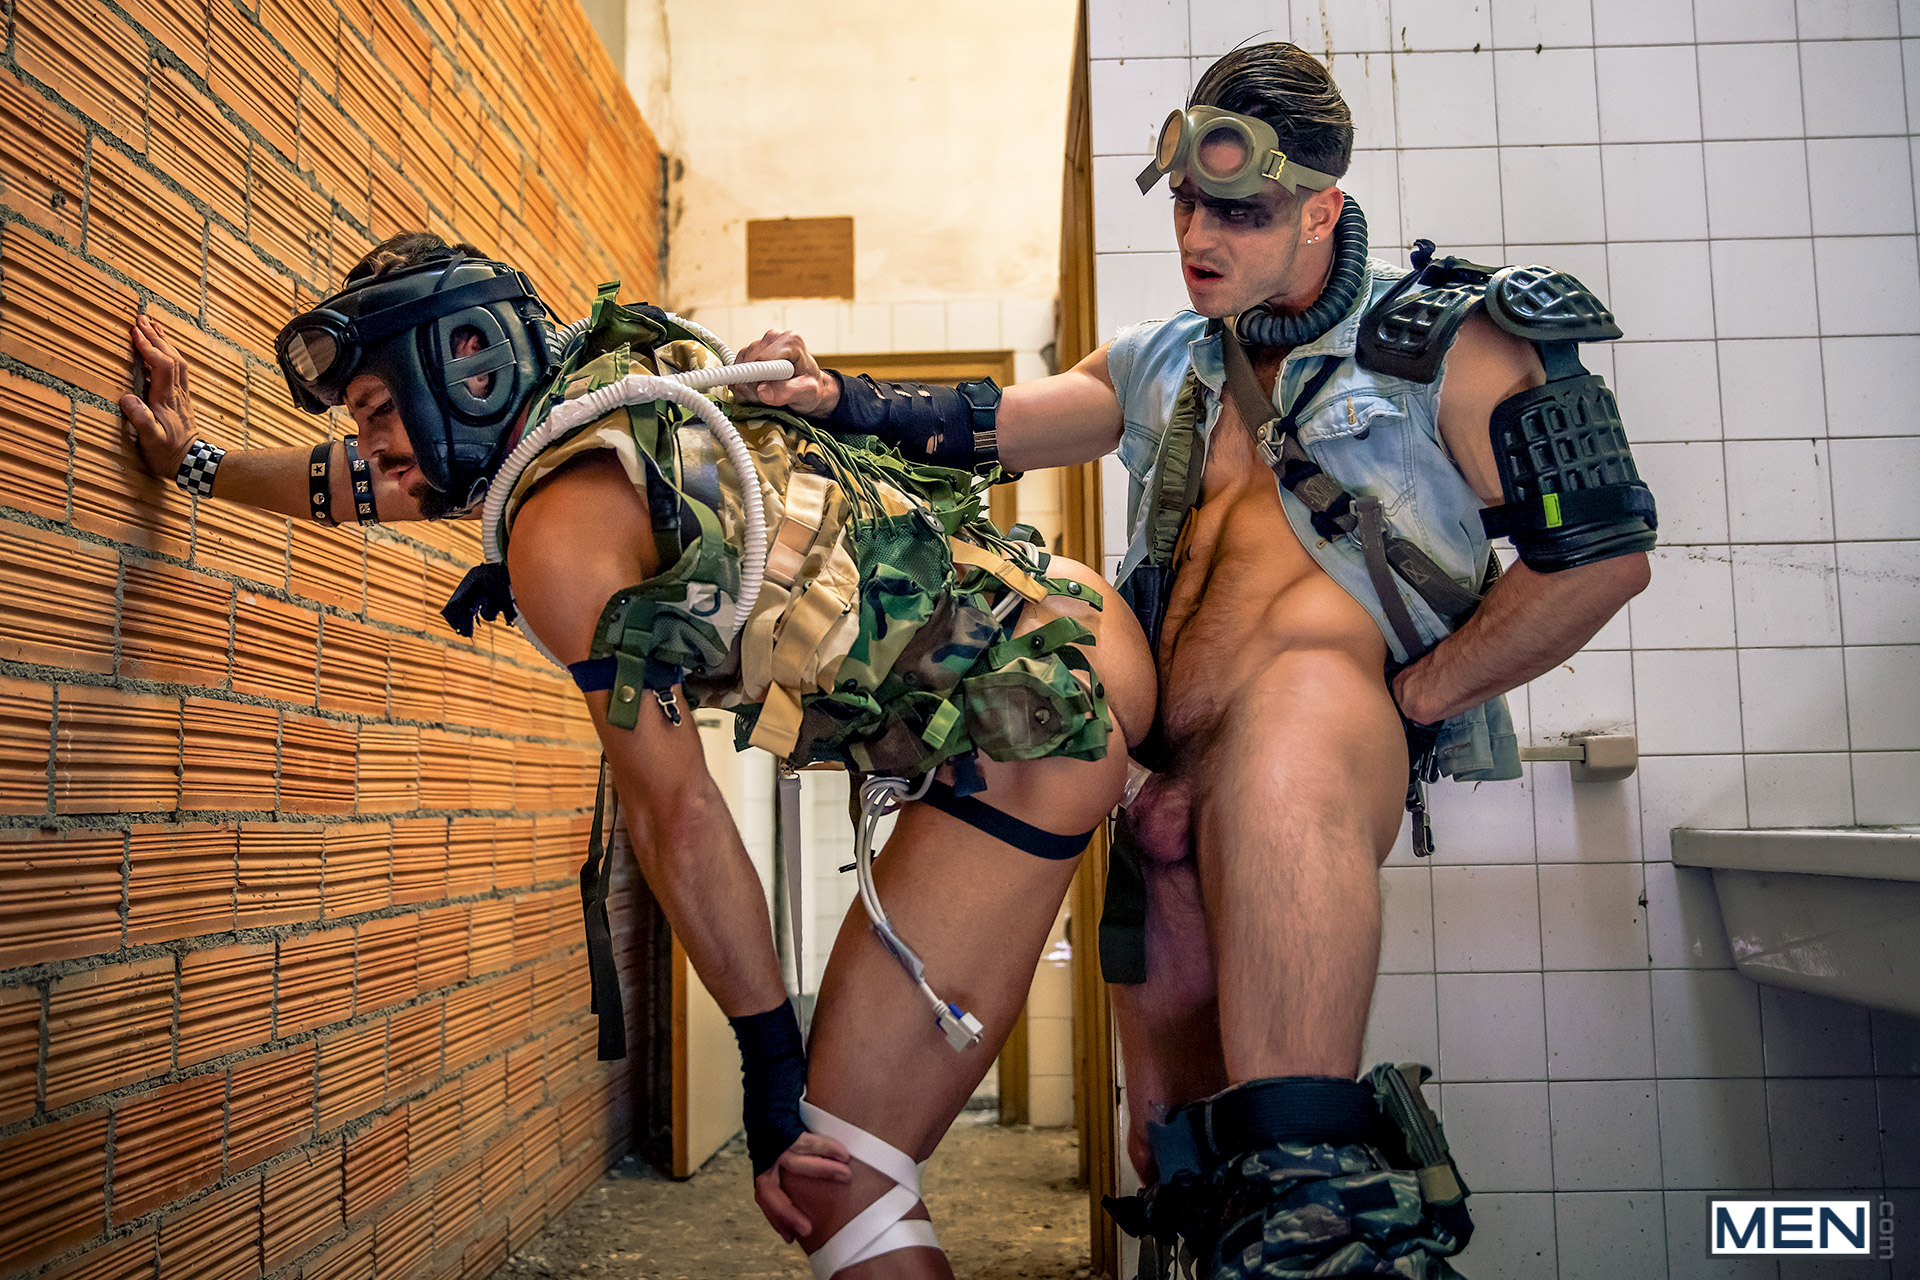 Casting porno d un couple francais de lyon - 1 part 2